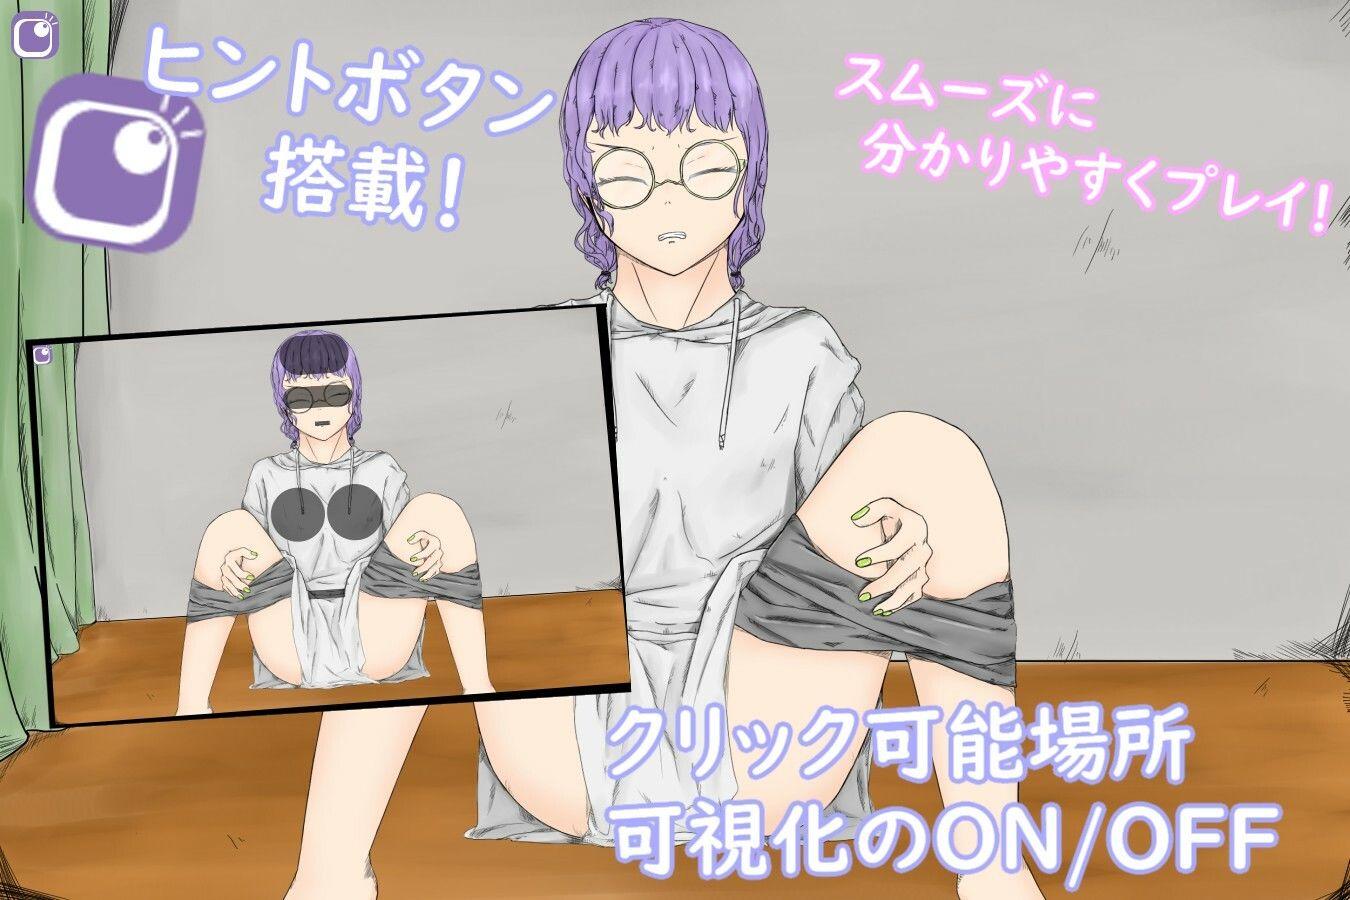 StudyTimeGlassesGirl〜勉強しない一つ下の後輩をお仕置き拘束プレイ〜